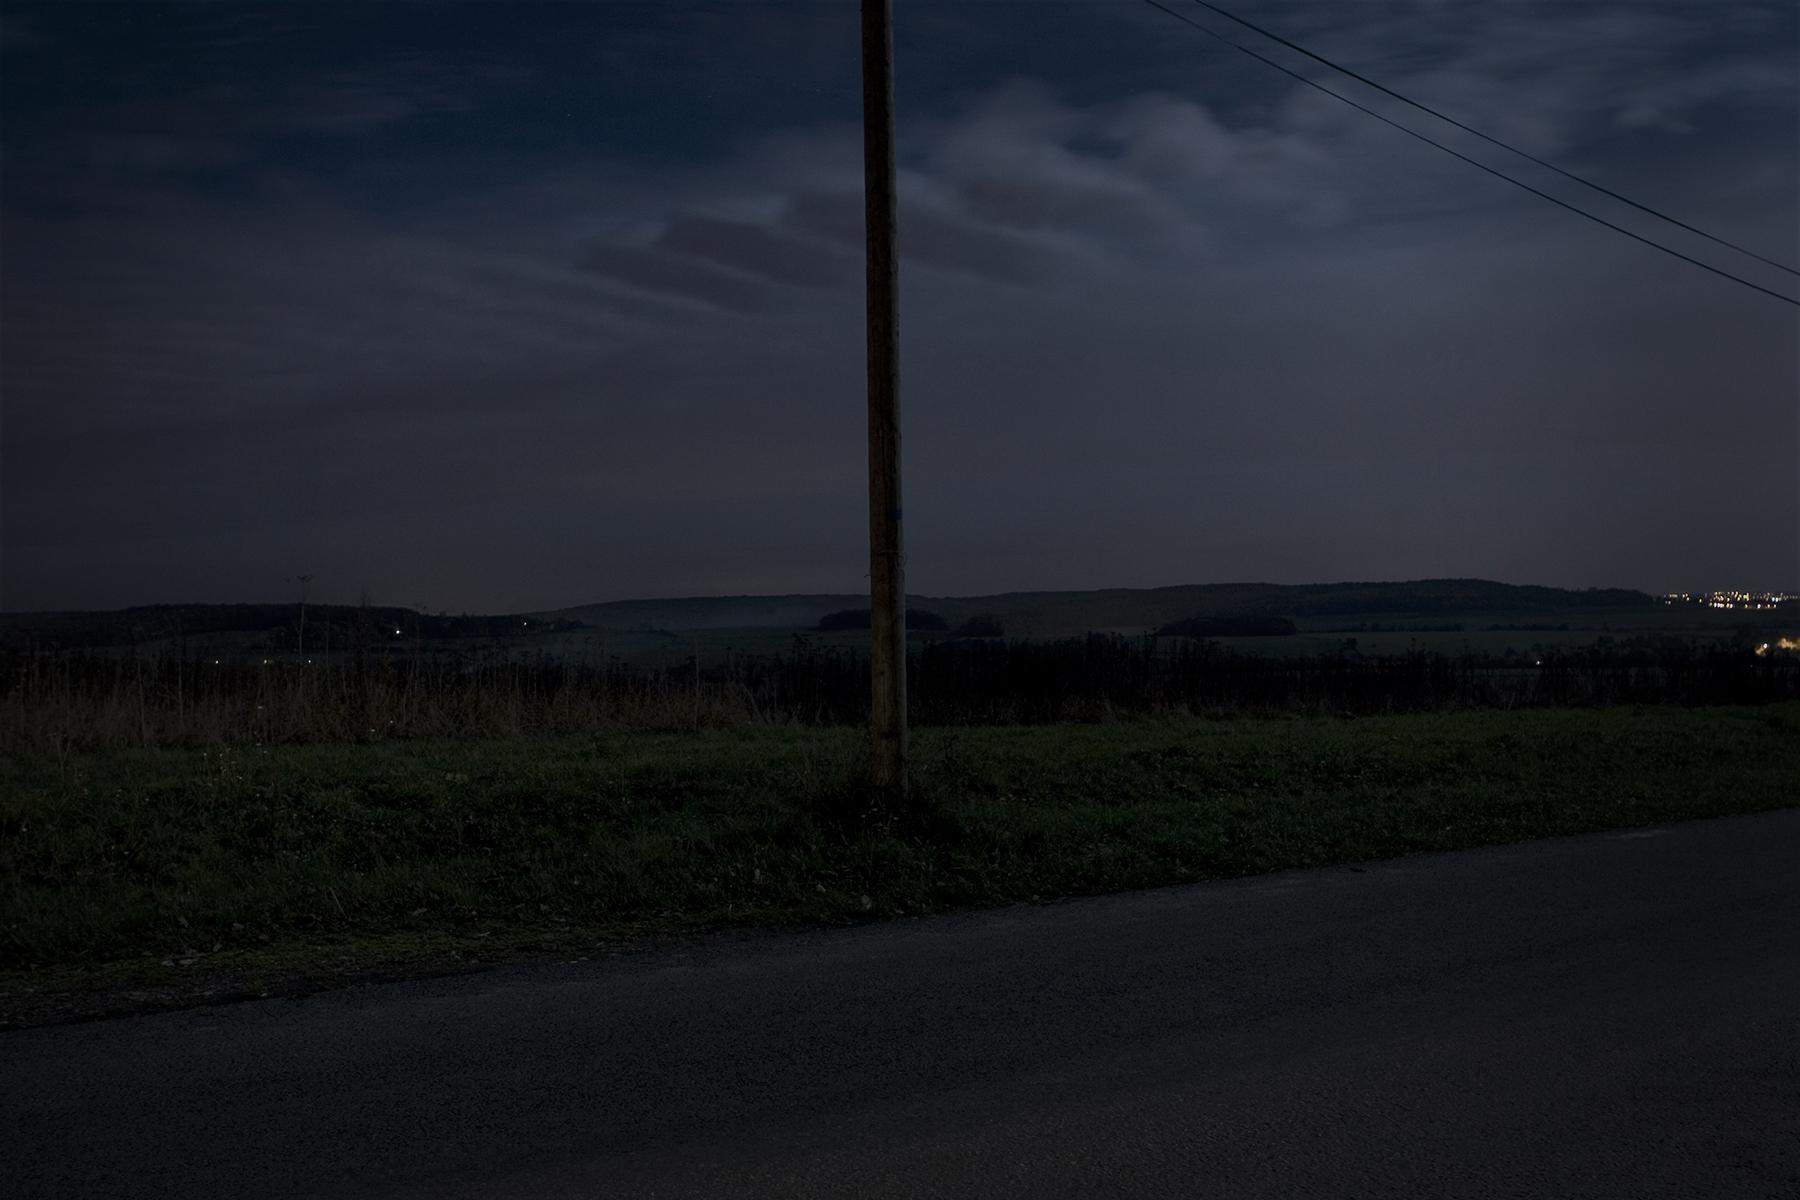 paysage_nuit02 copy.jpg